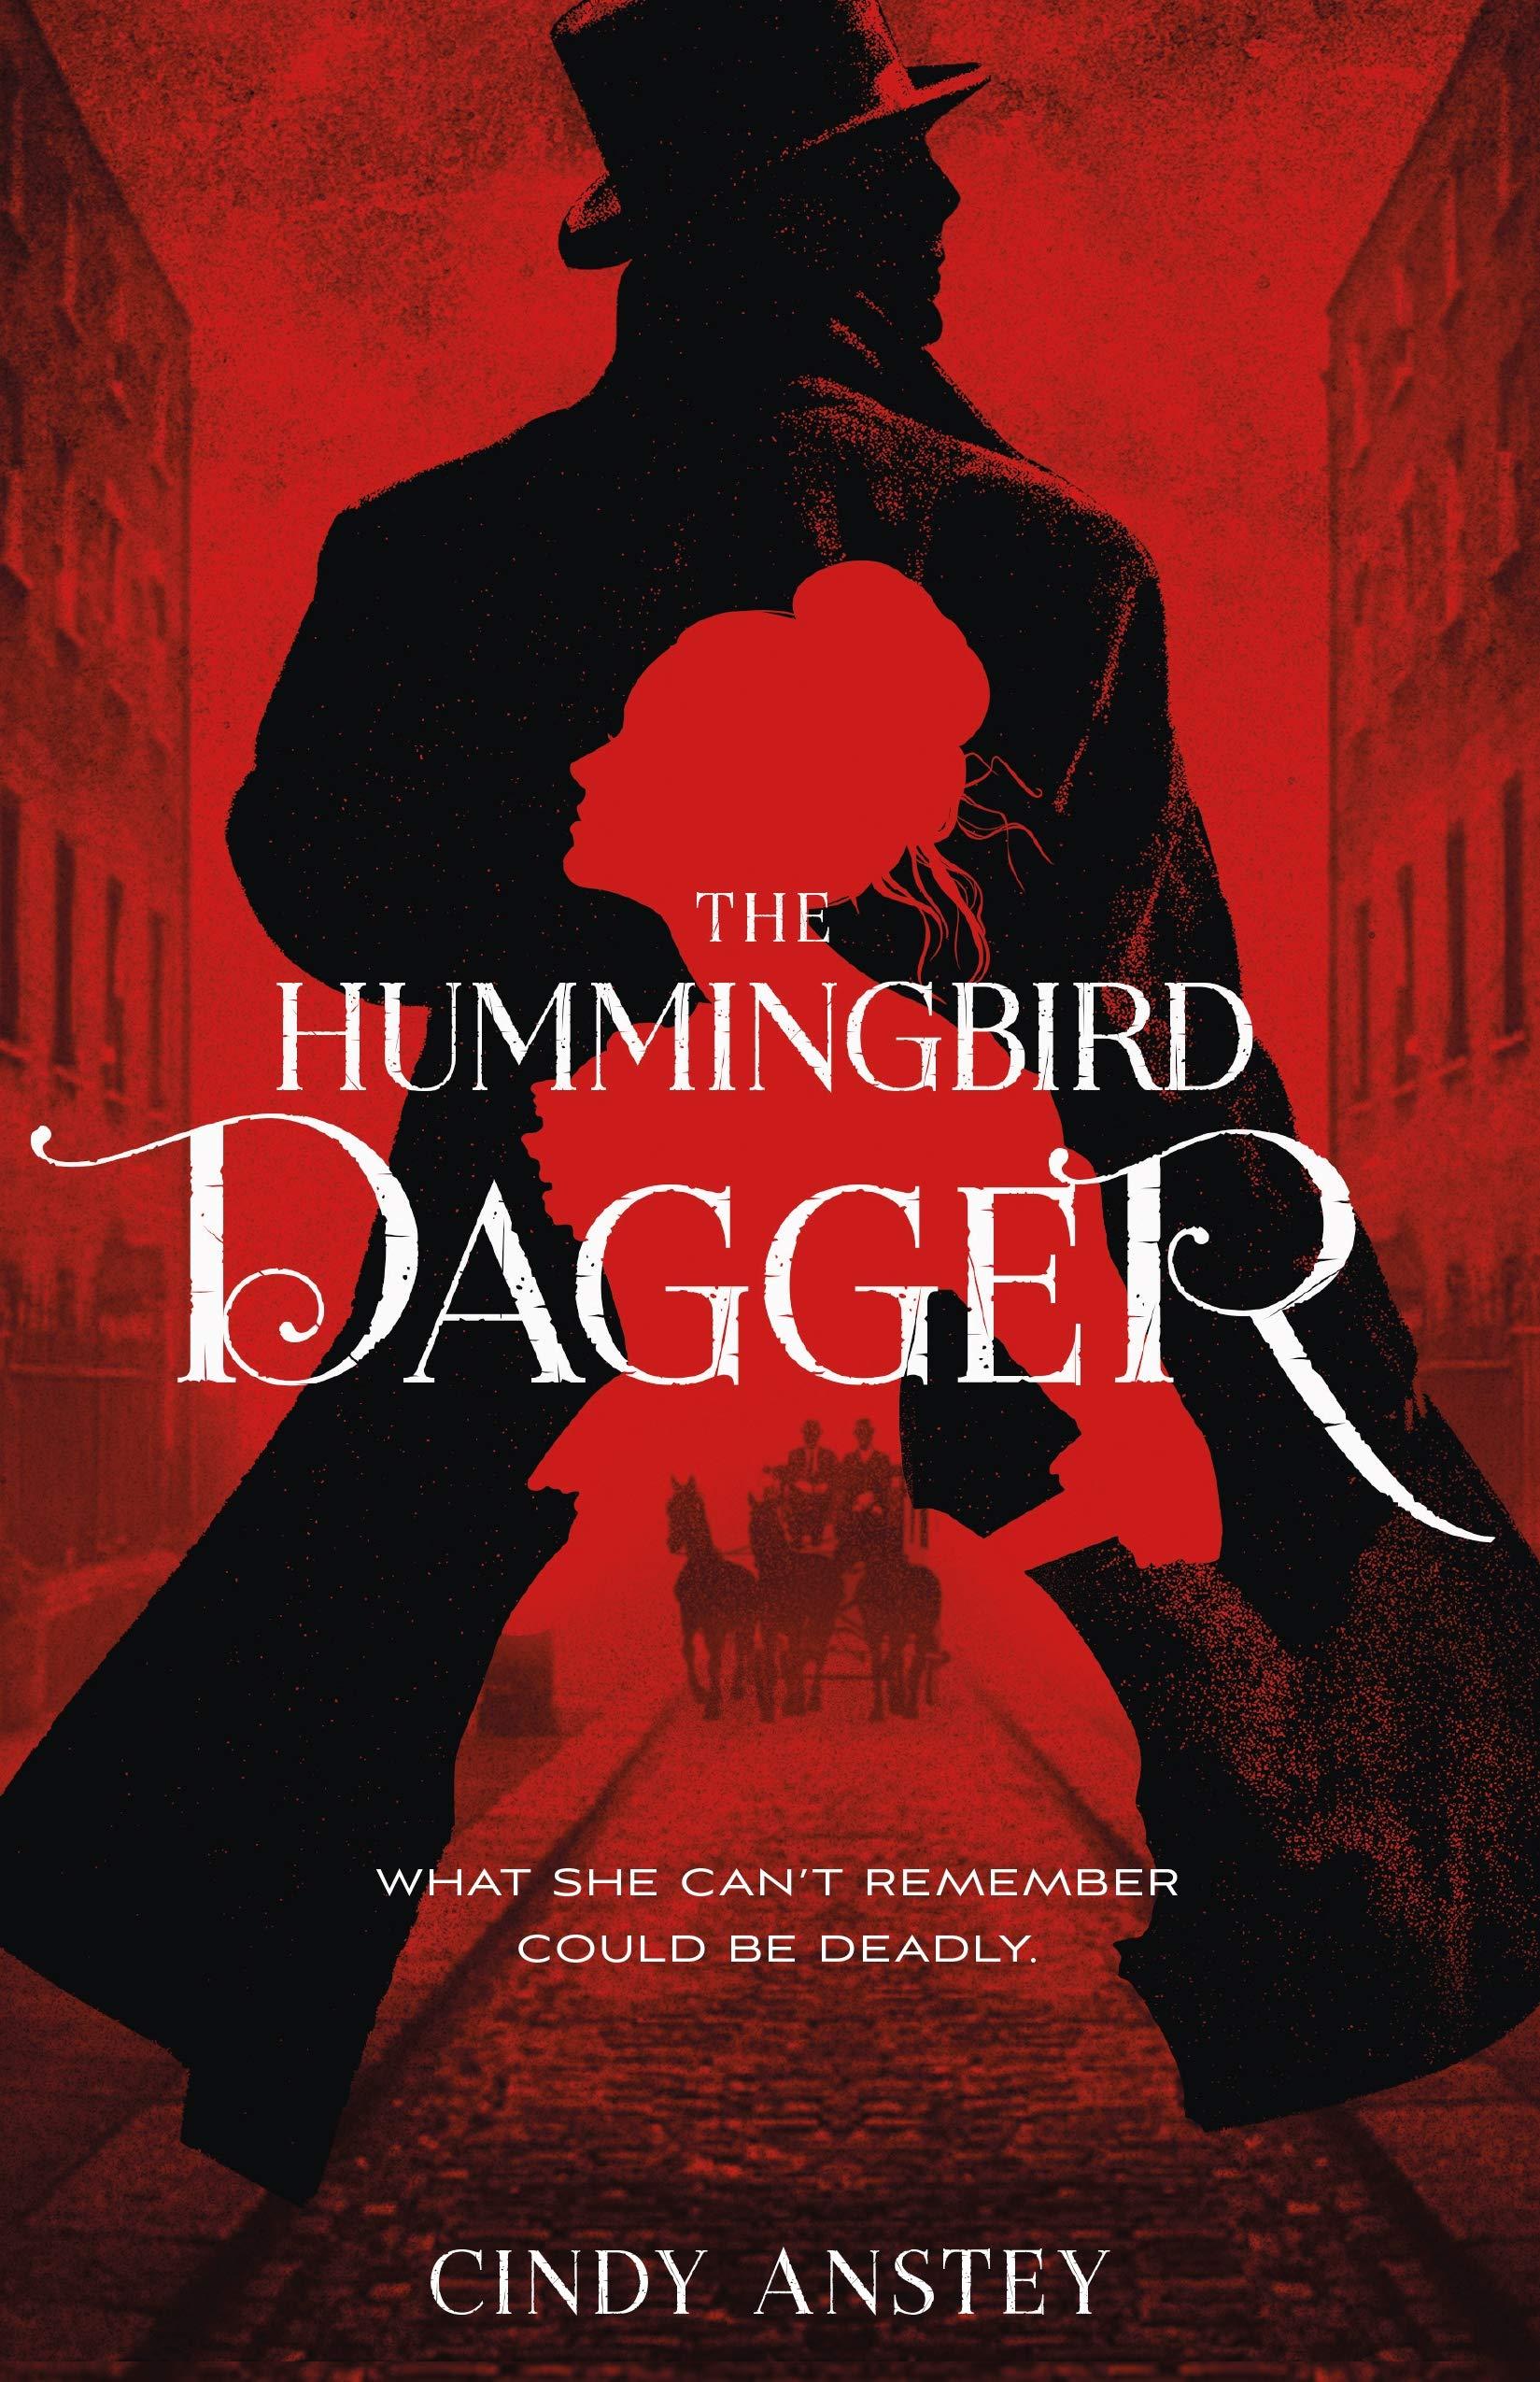 Amazon.com: The Hummingbird Dagger (9781250174895): Anstey, Cindy ...